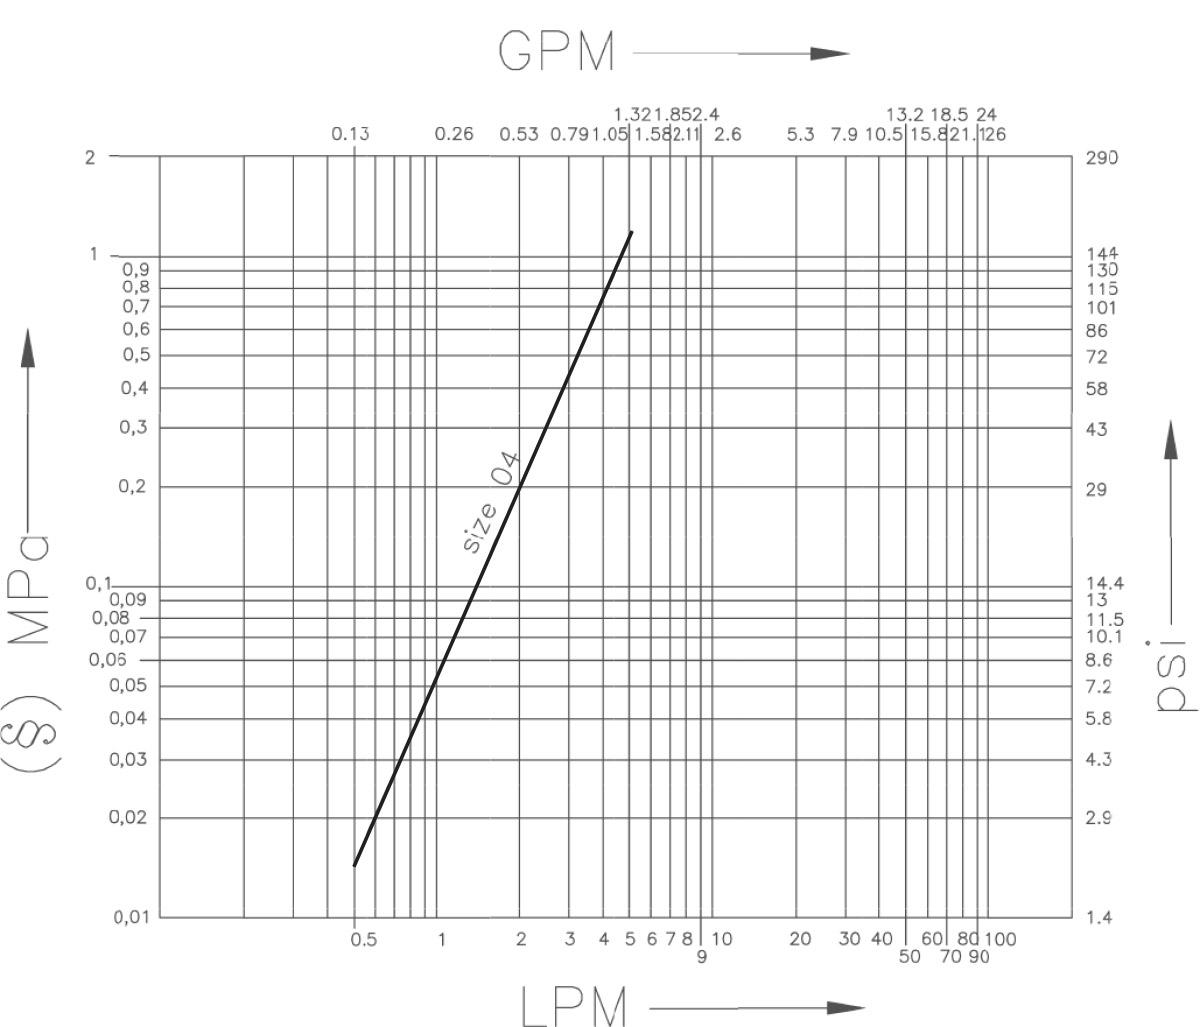 Force Flow Rate: Diagnostic Couplings, ISO 15171-1 Interchange